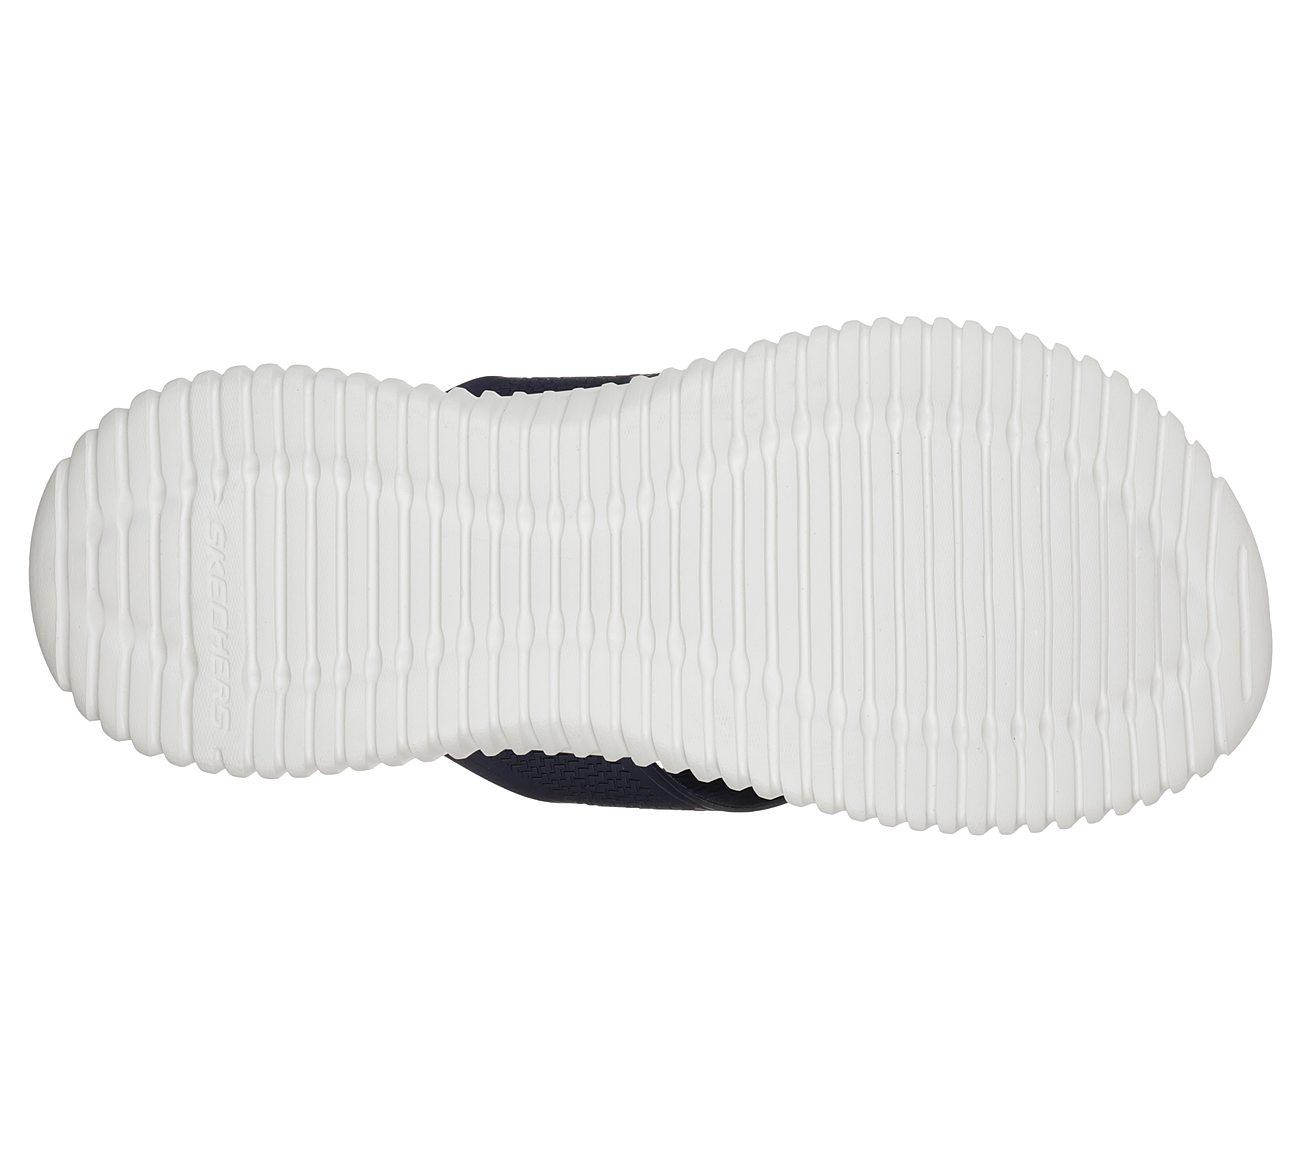 ebb90793d353 Buy SKECHERS Elite Flex - Coastal Mist Sport Shoes only  45.00